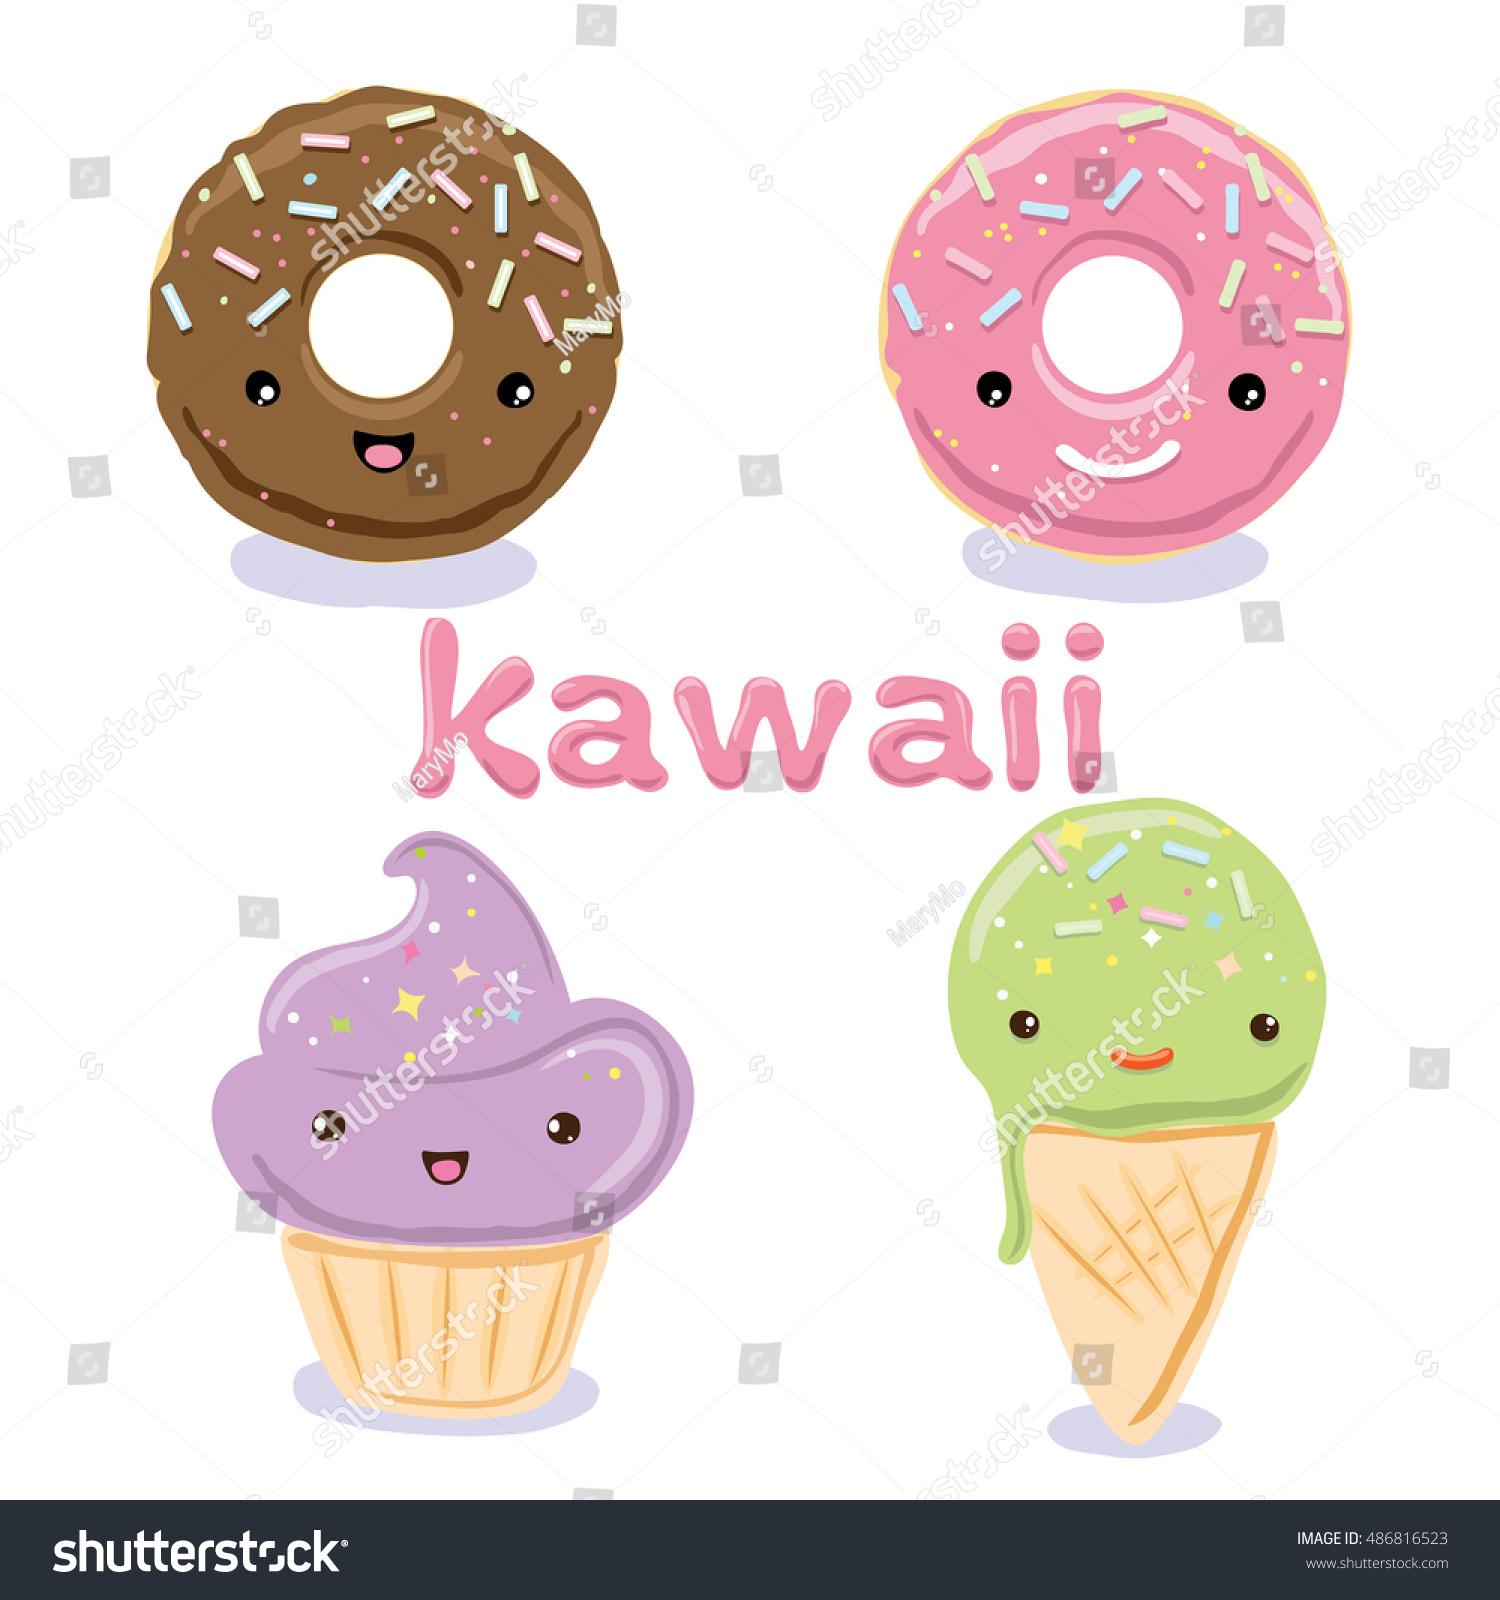 Uncategorized Cute Kawaii Food cute kawaii food characters cupcake icecream stock vector ice cream cone donuts lovely doodle